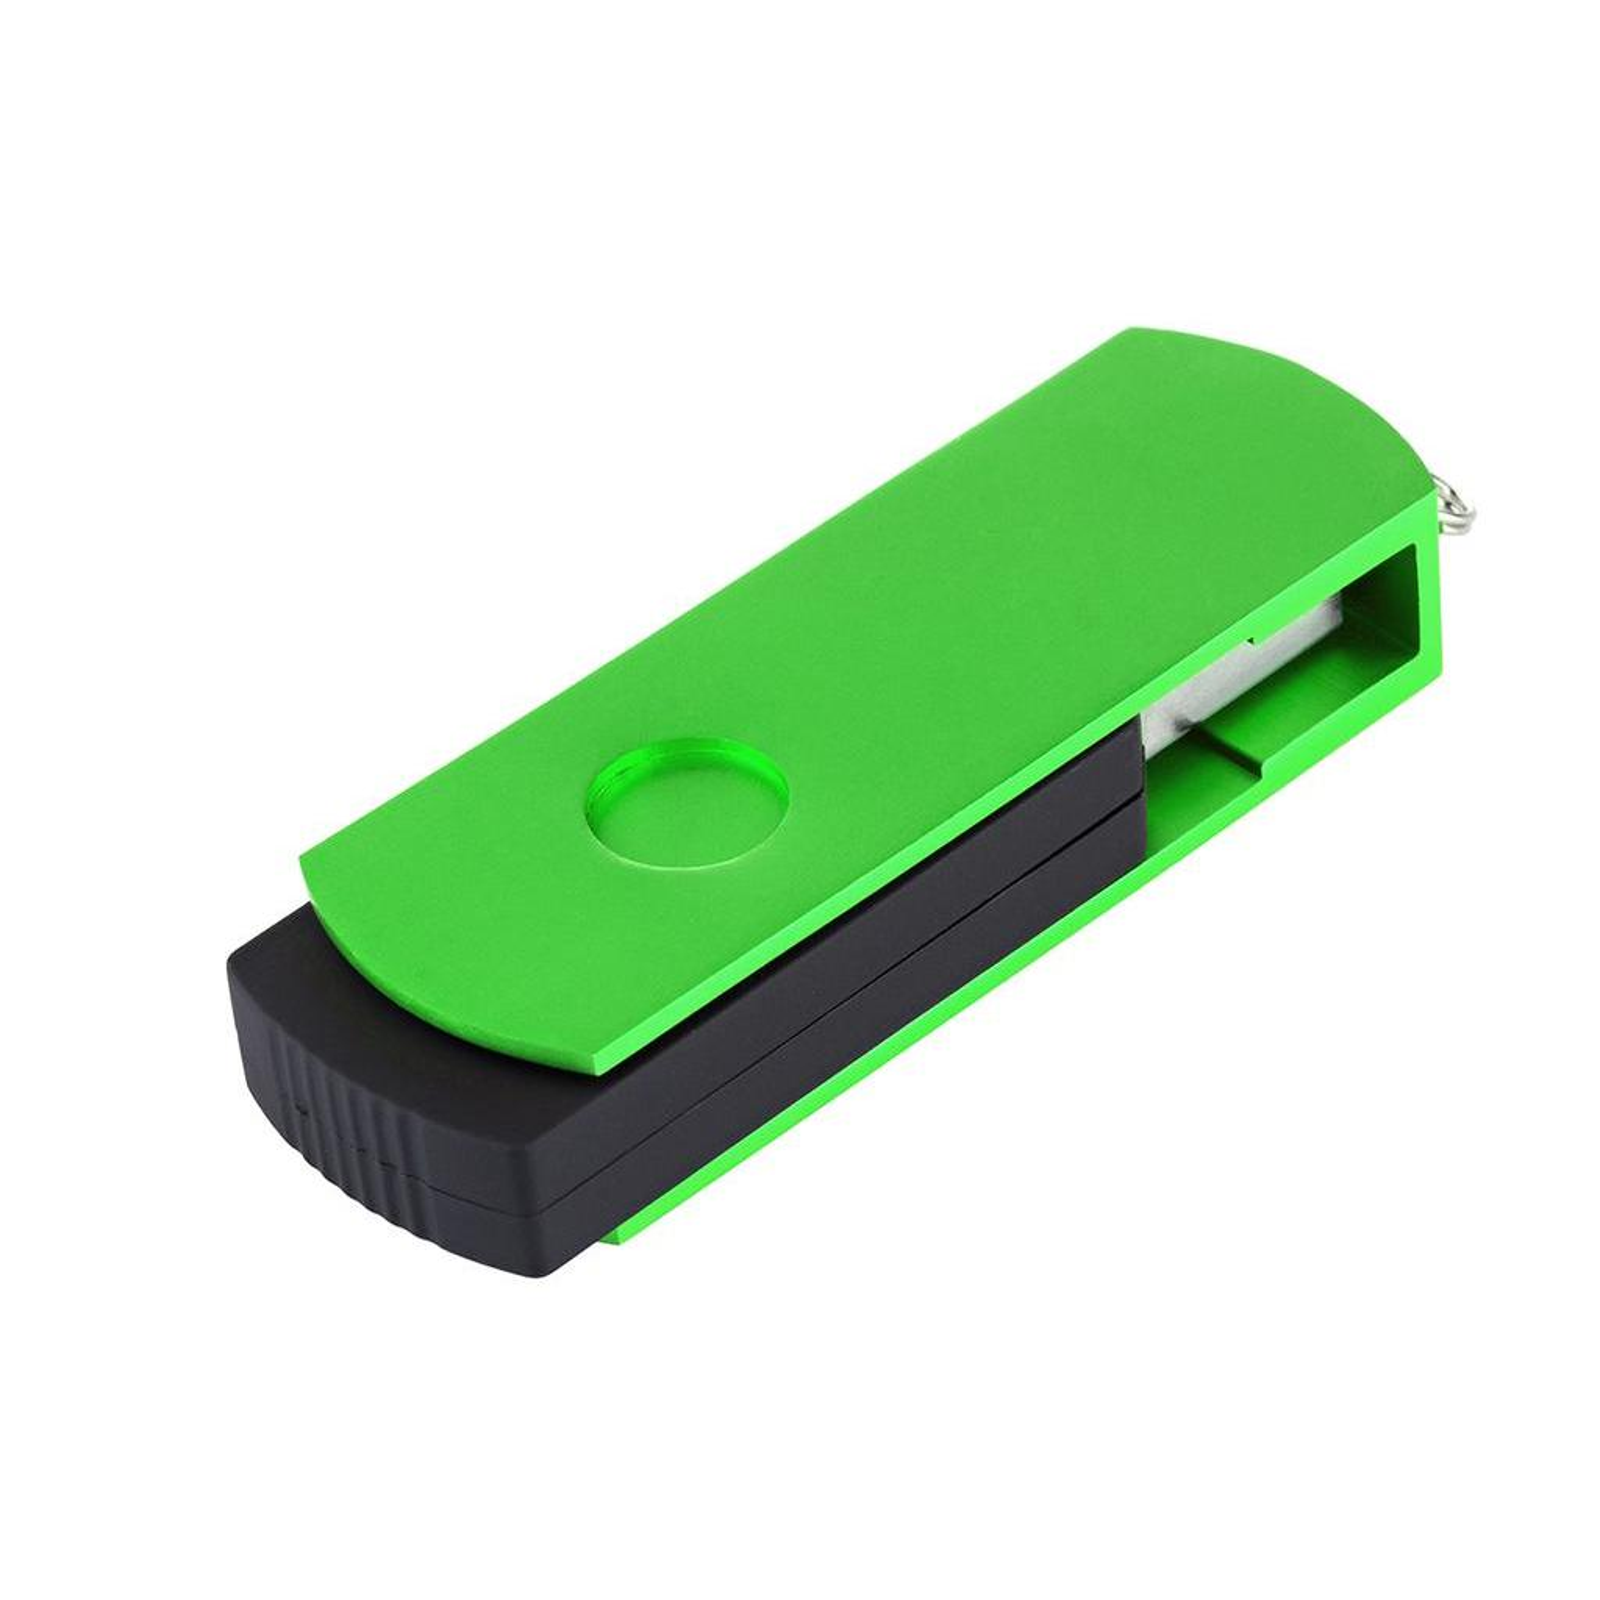 USB флеш накопитель eXceleram 8GB P2 Series Green/Black USB 2.0 (EXP2U2GRB08) изображение 6